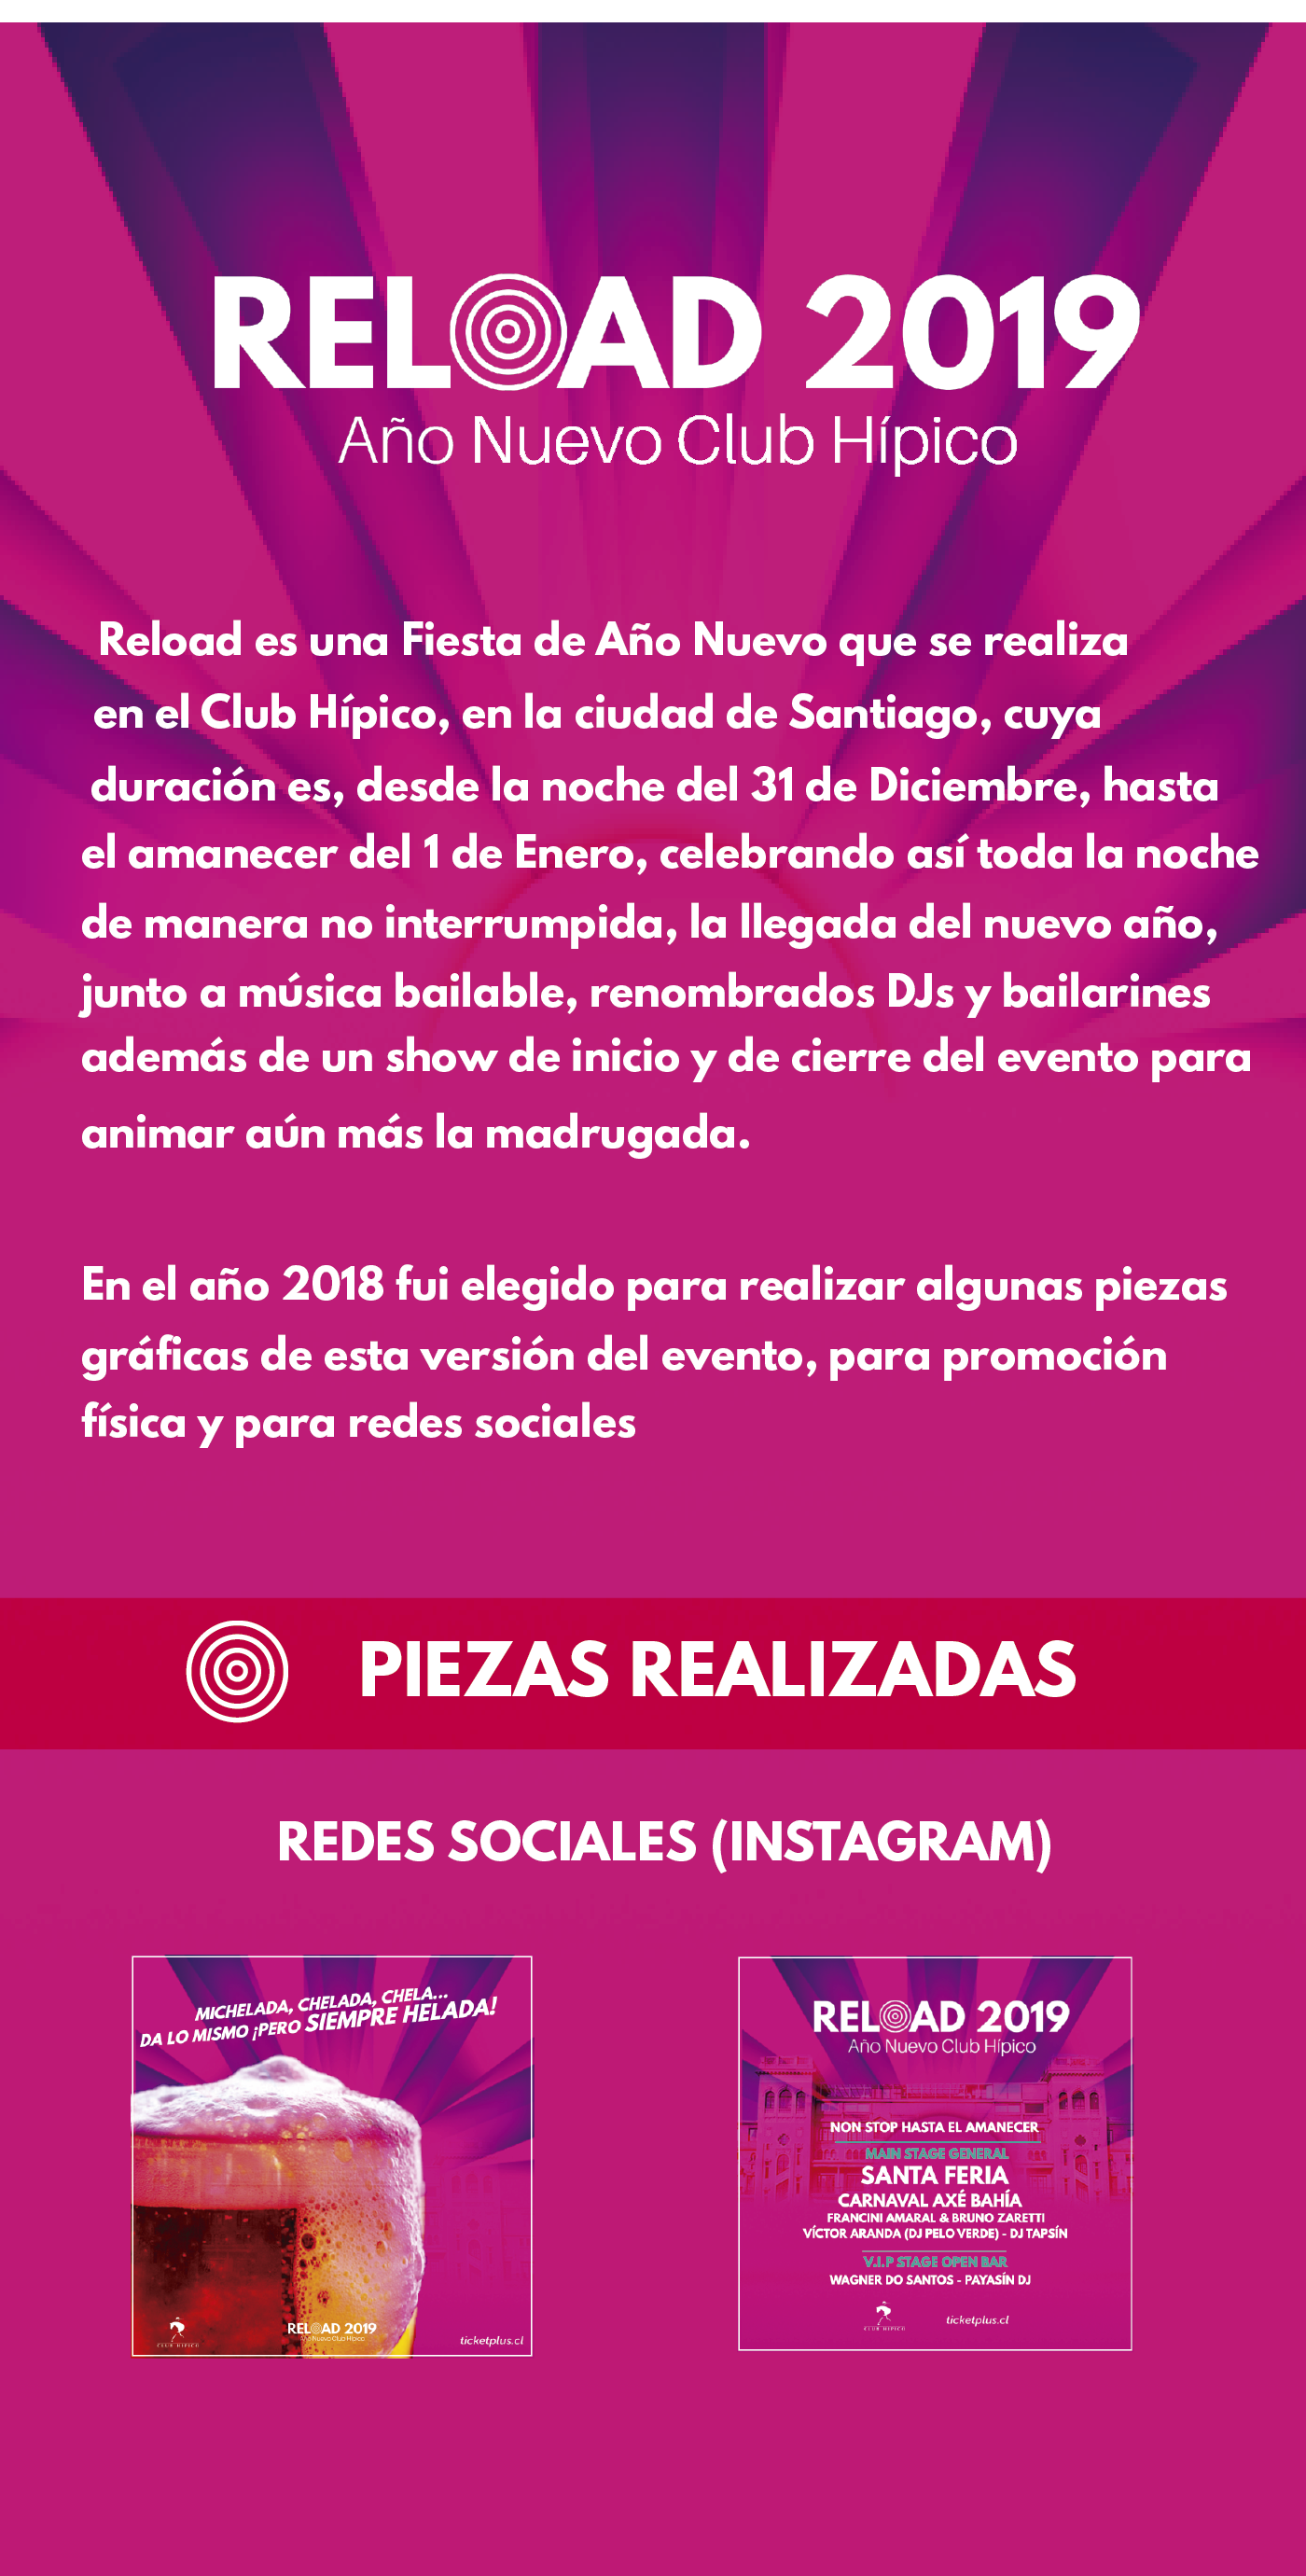 fiesta new year's eve fin de año Bailable musica dj redes sociales baile party DANCE